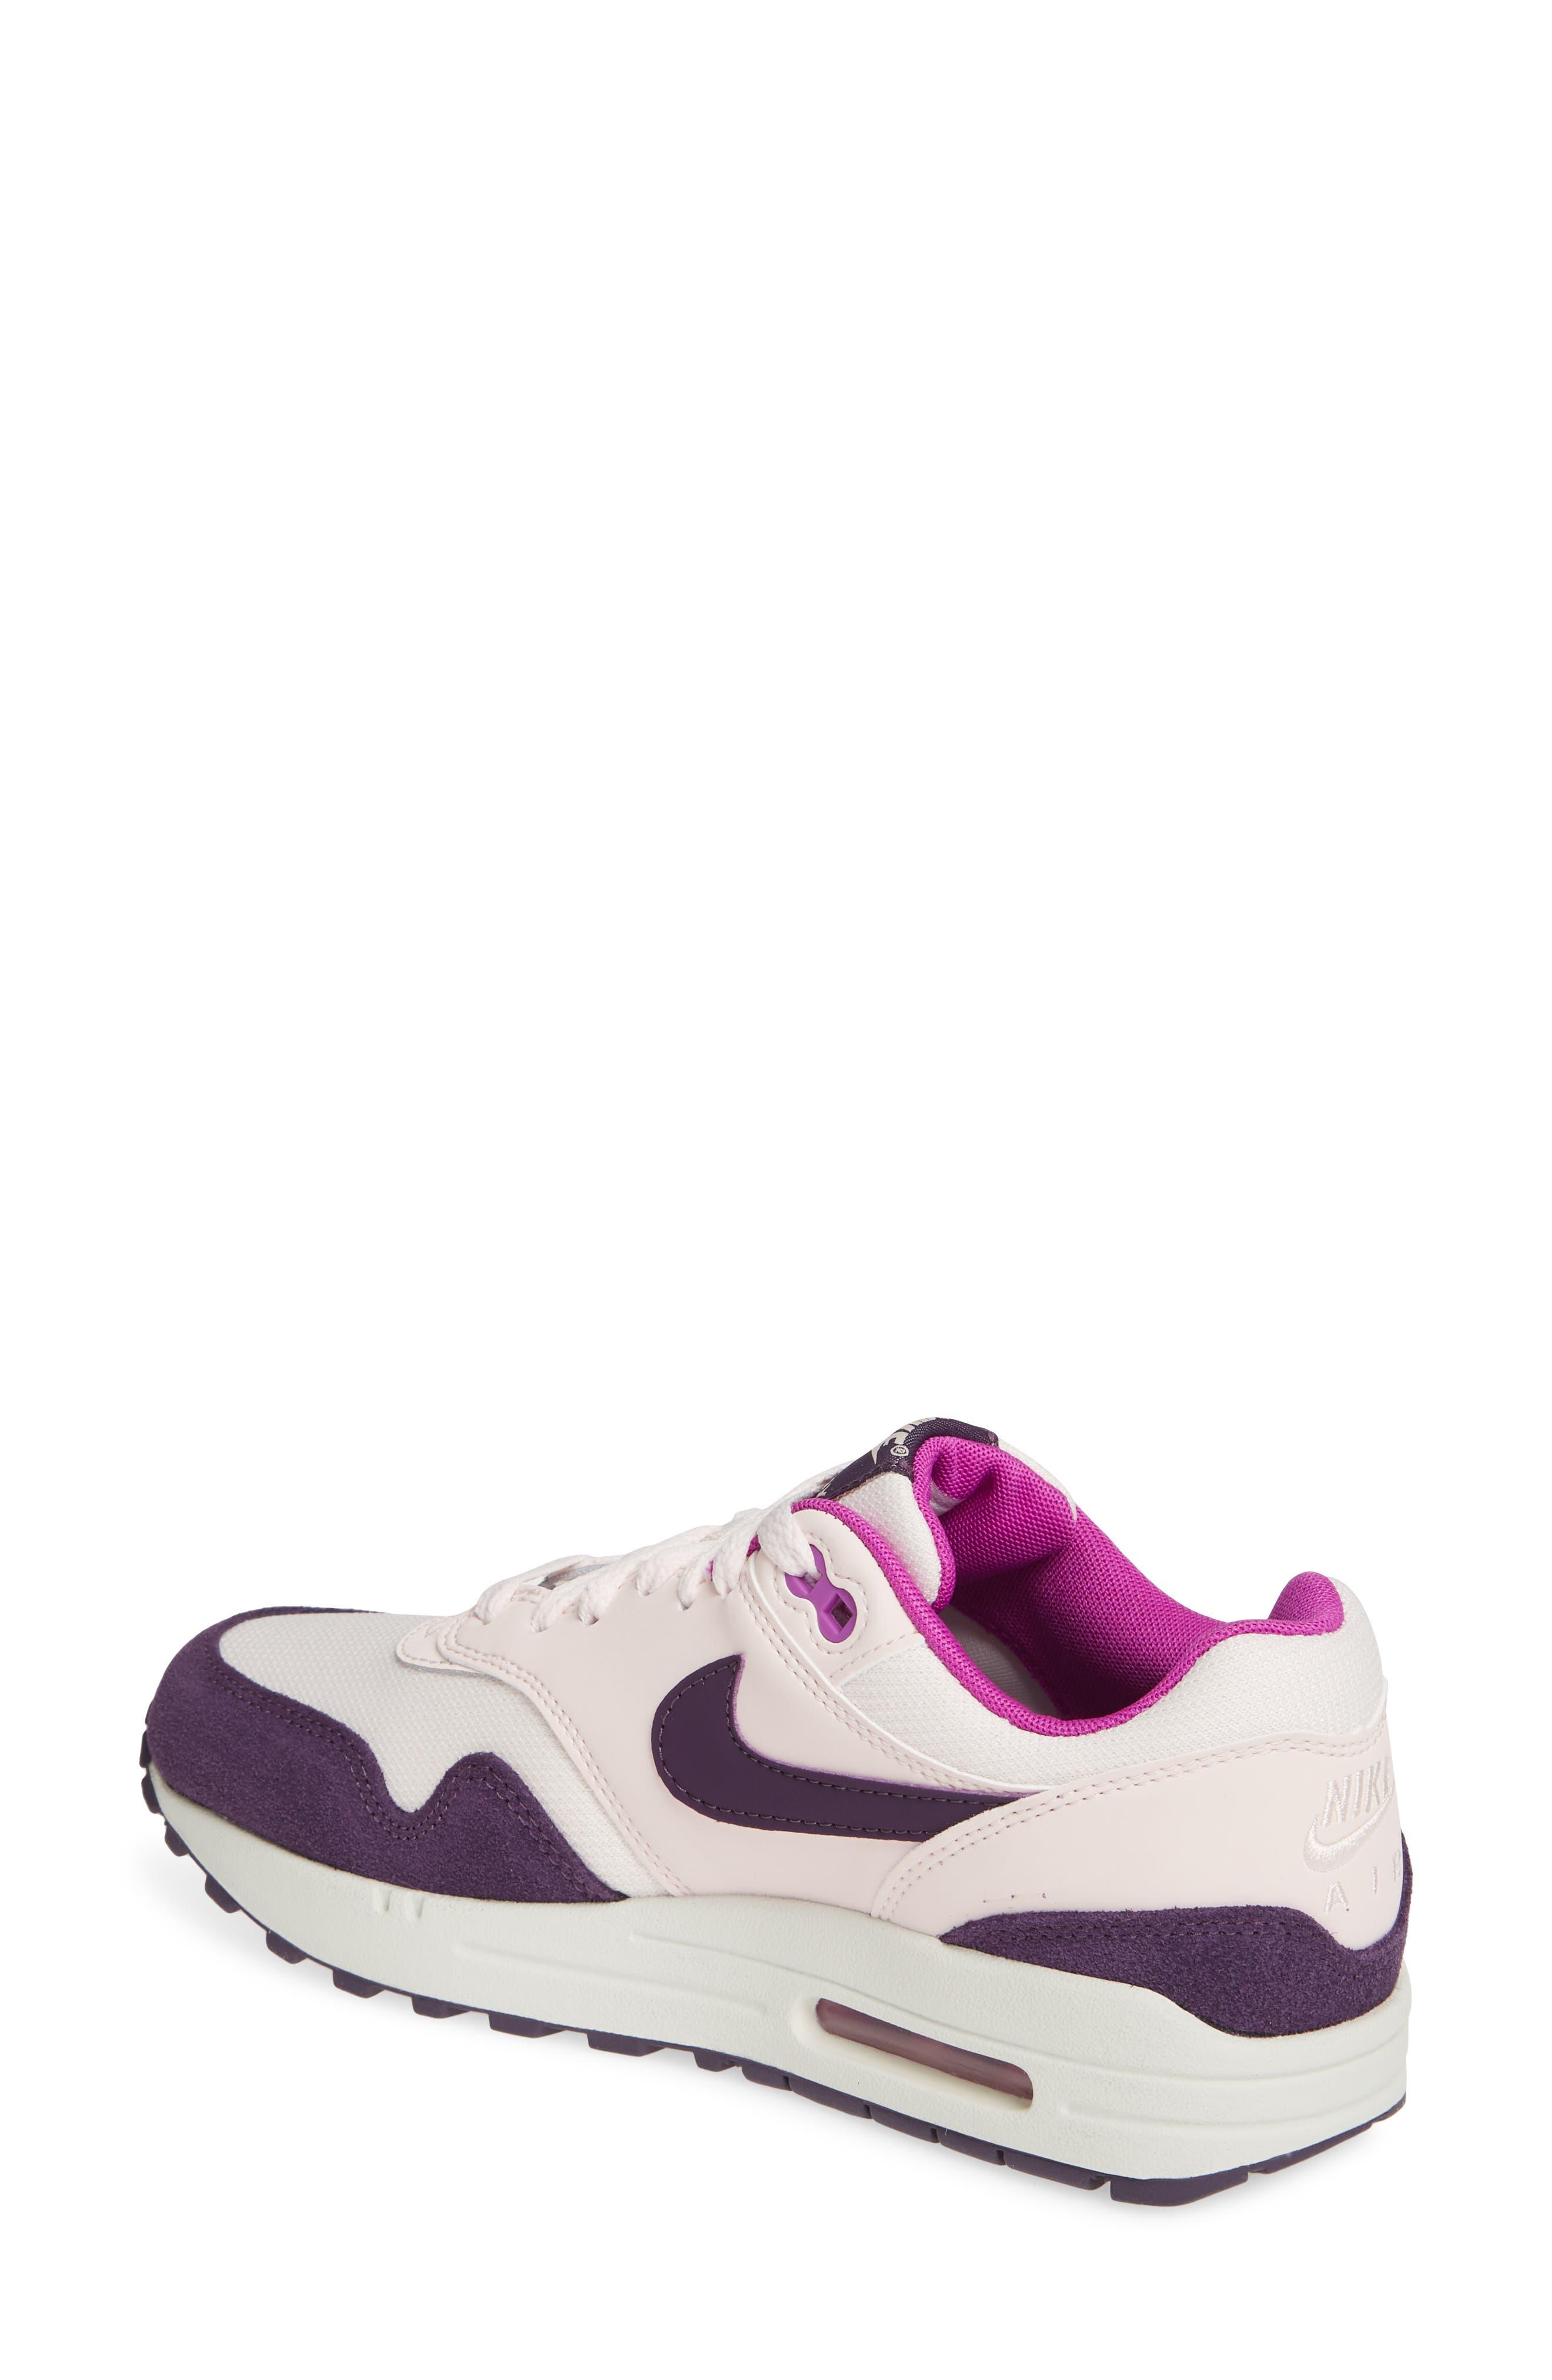 dd0b47f6293b2 Women's Nike Shoes   Nordstrom